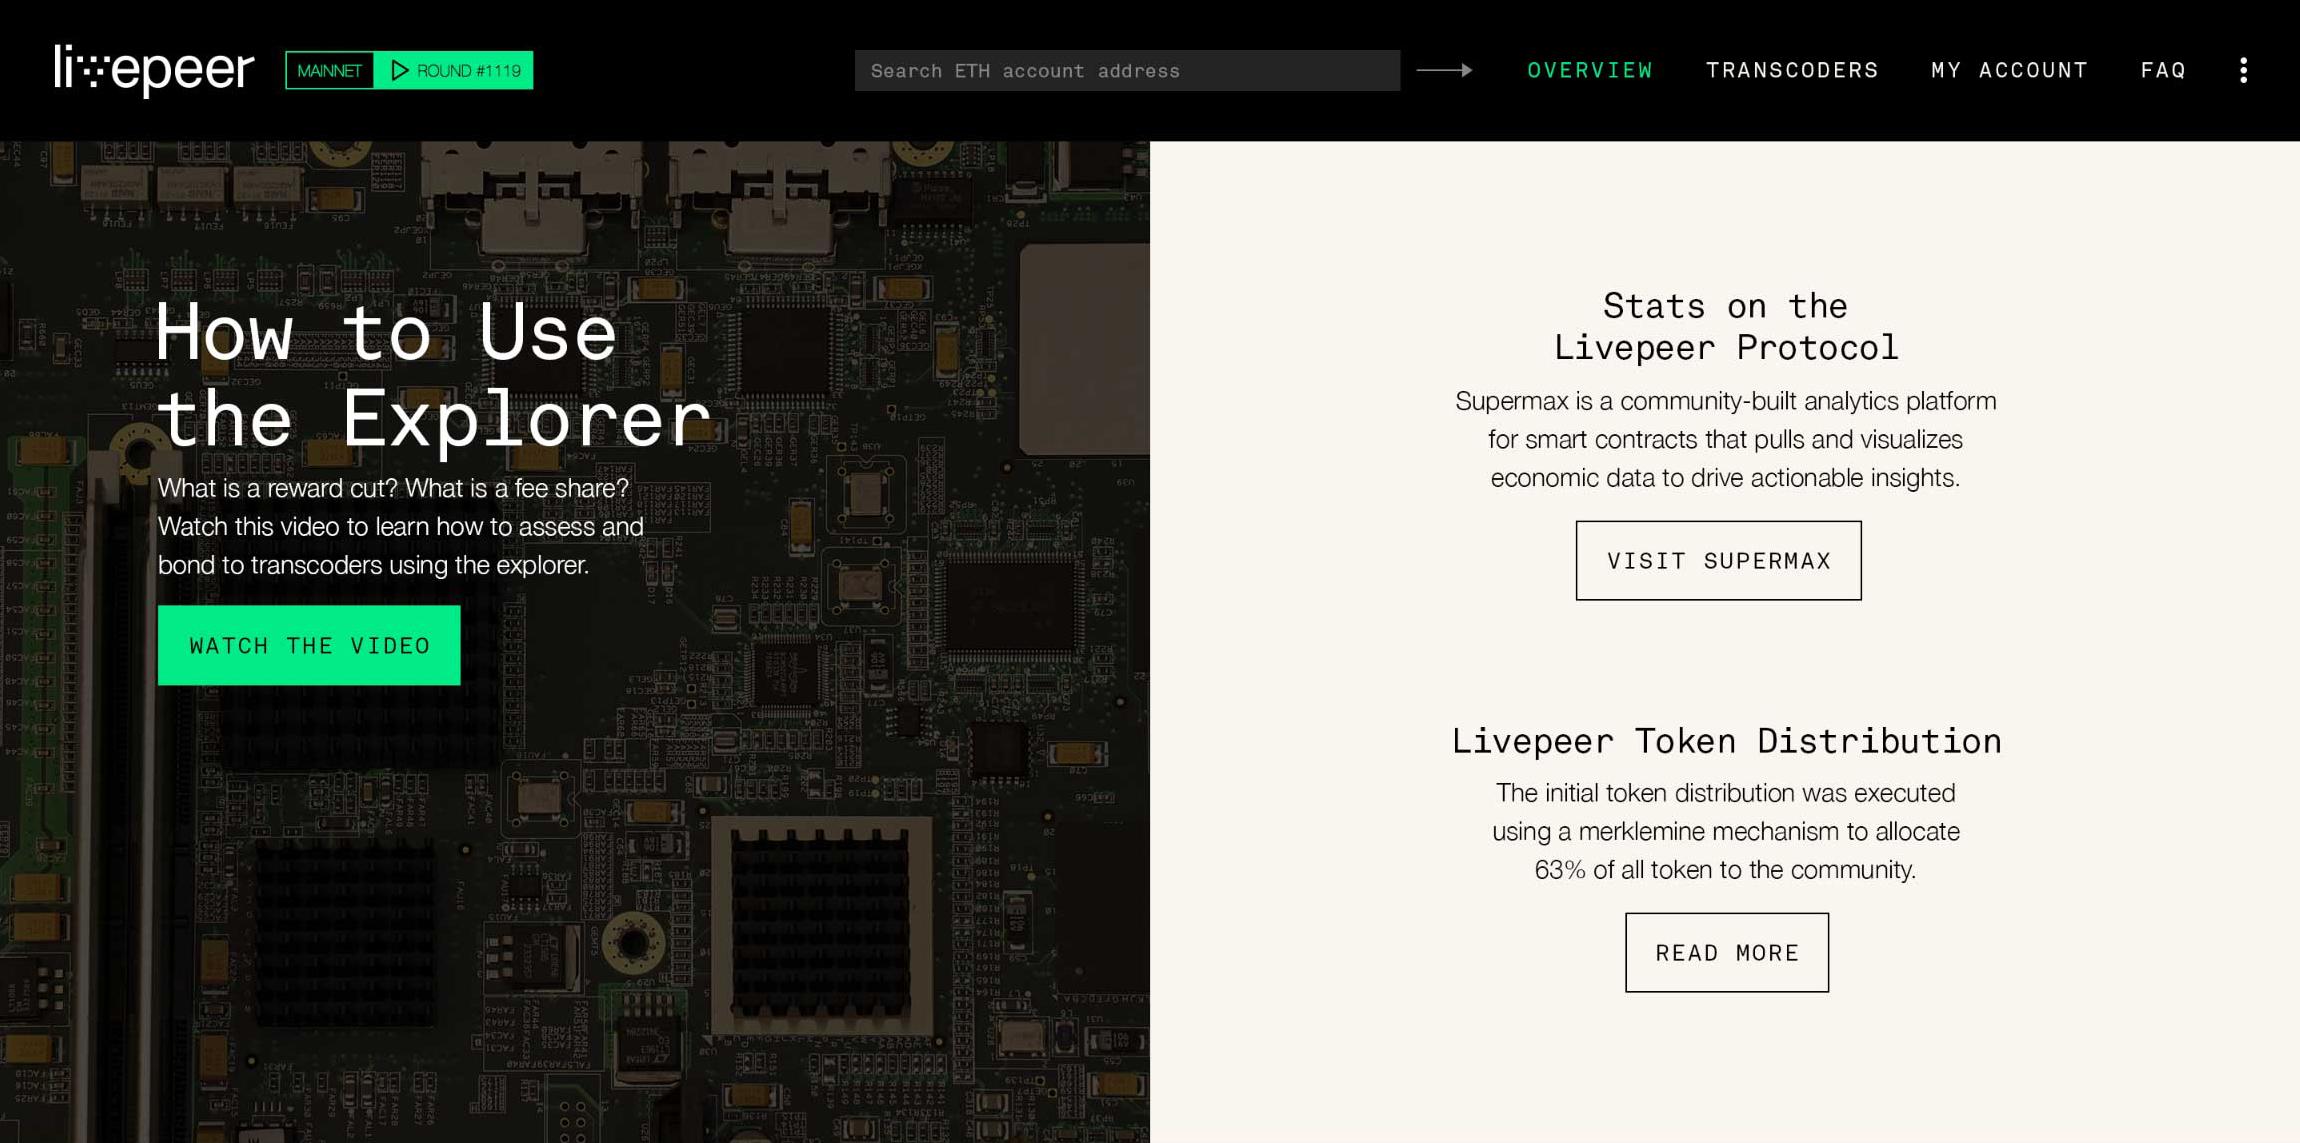 Livepeer_ProtocolExplorer.jpg